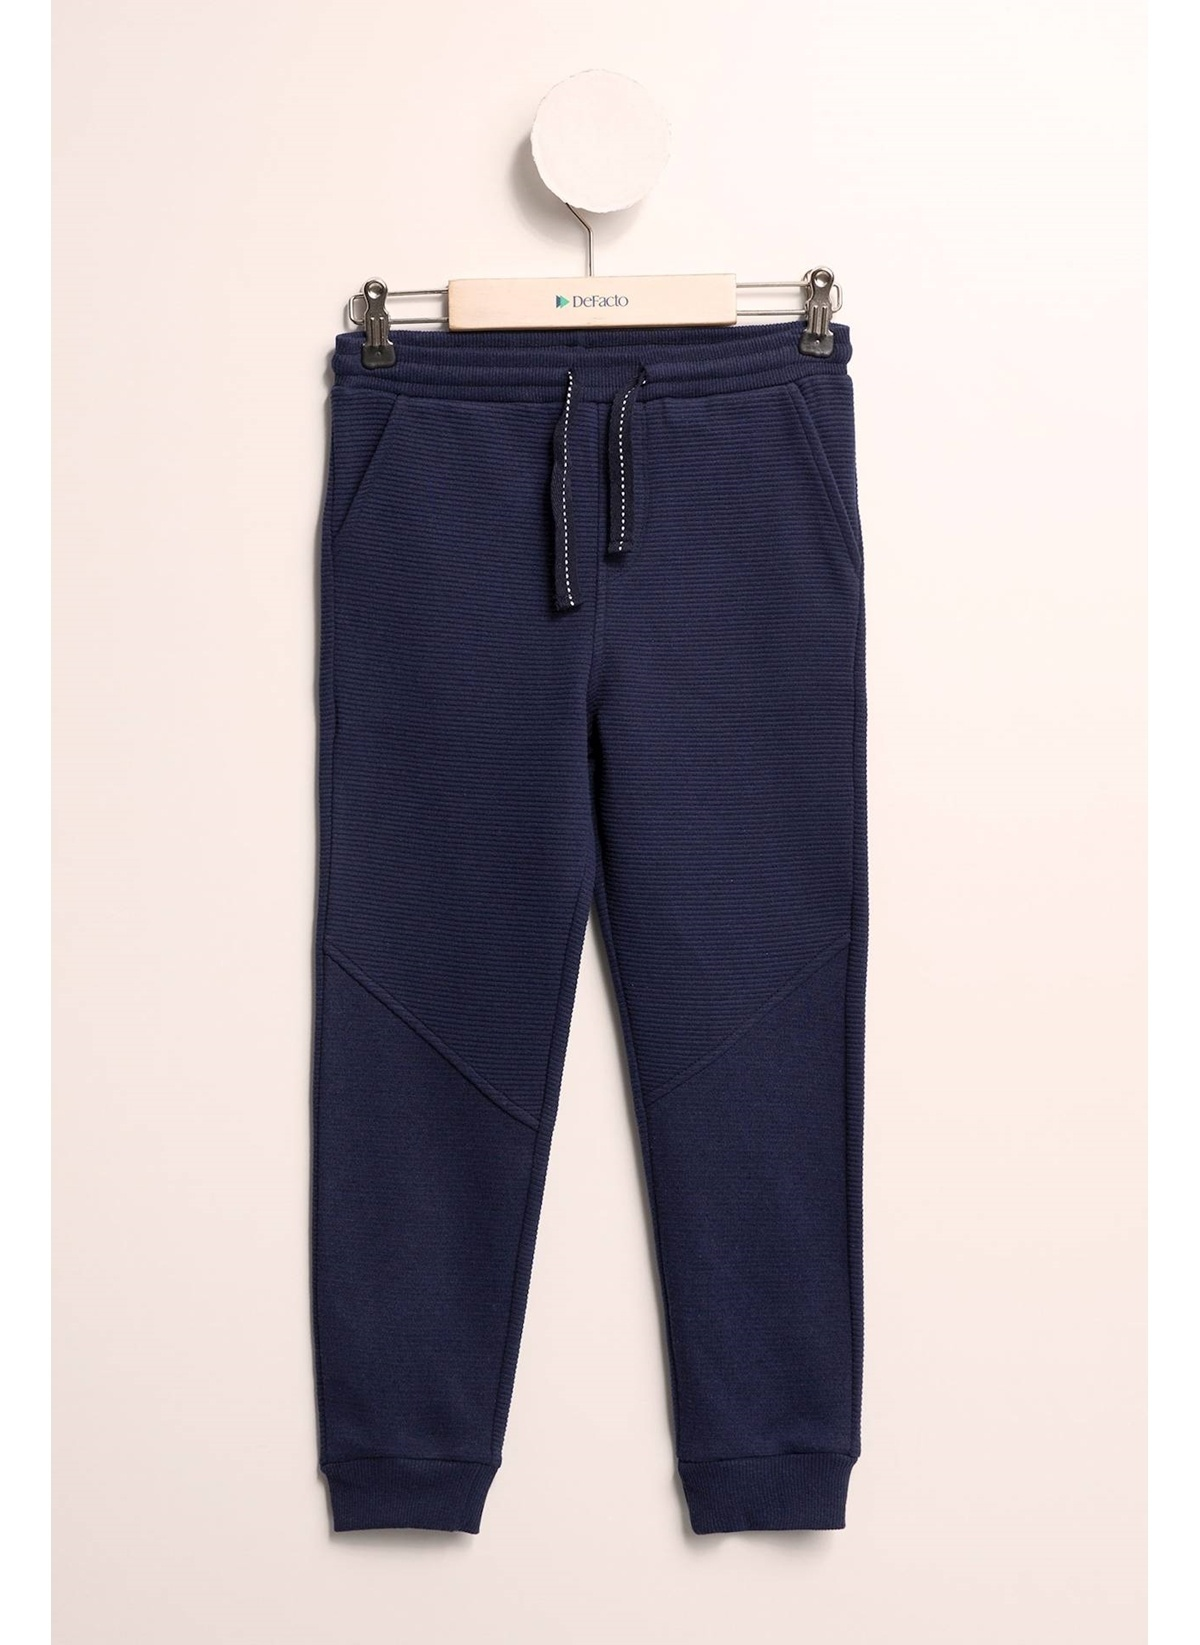 Defacto Pantolon K8091a619spın33 Elastik Belli Slim Fit J – 29.99 TL